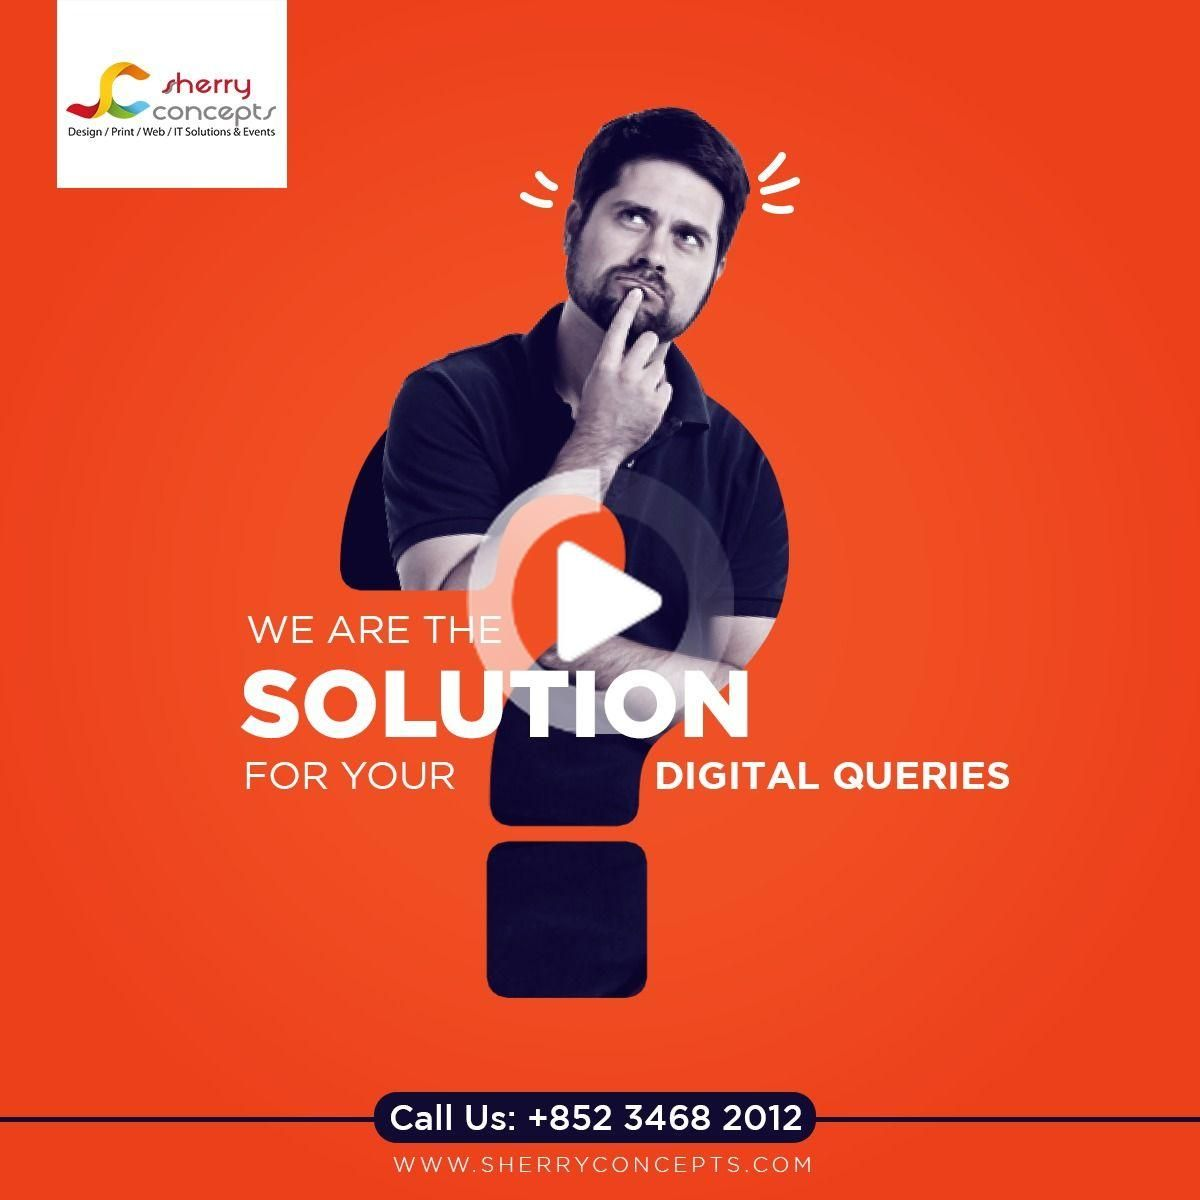 Webdesign Webdesign2020 In 2020 Social Media Design Inspiration Social Media Design Graphic Design Trends